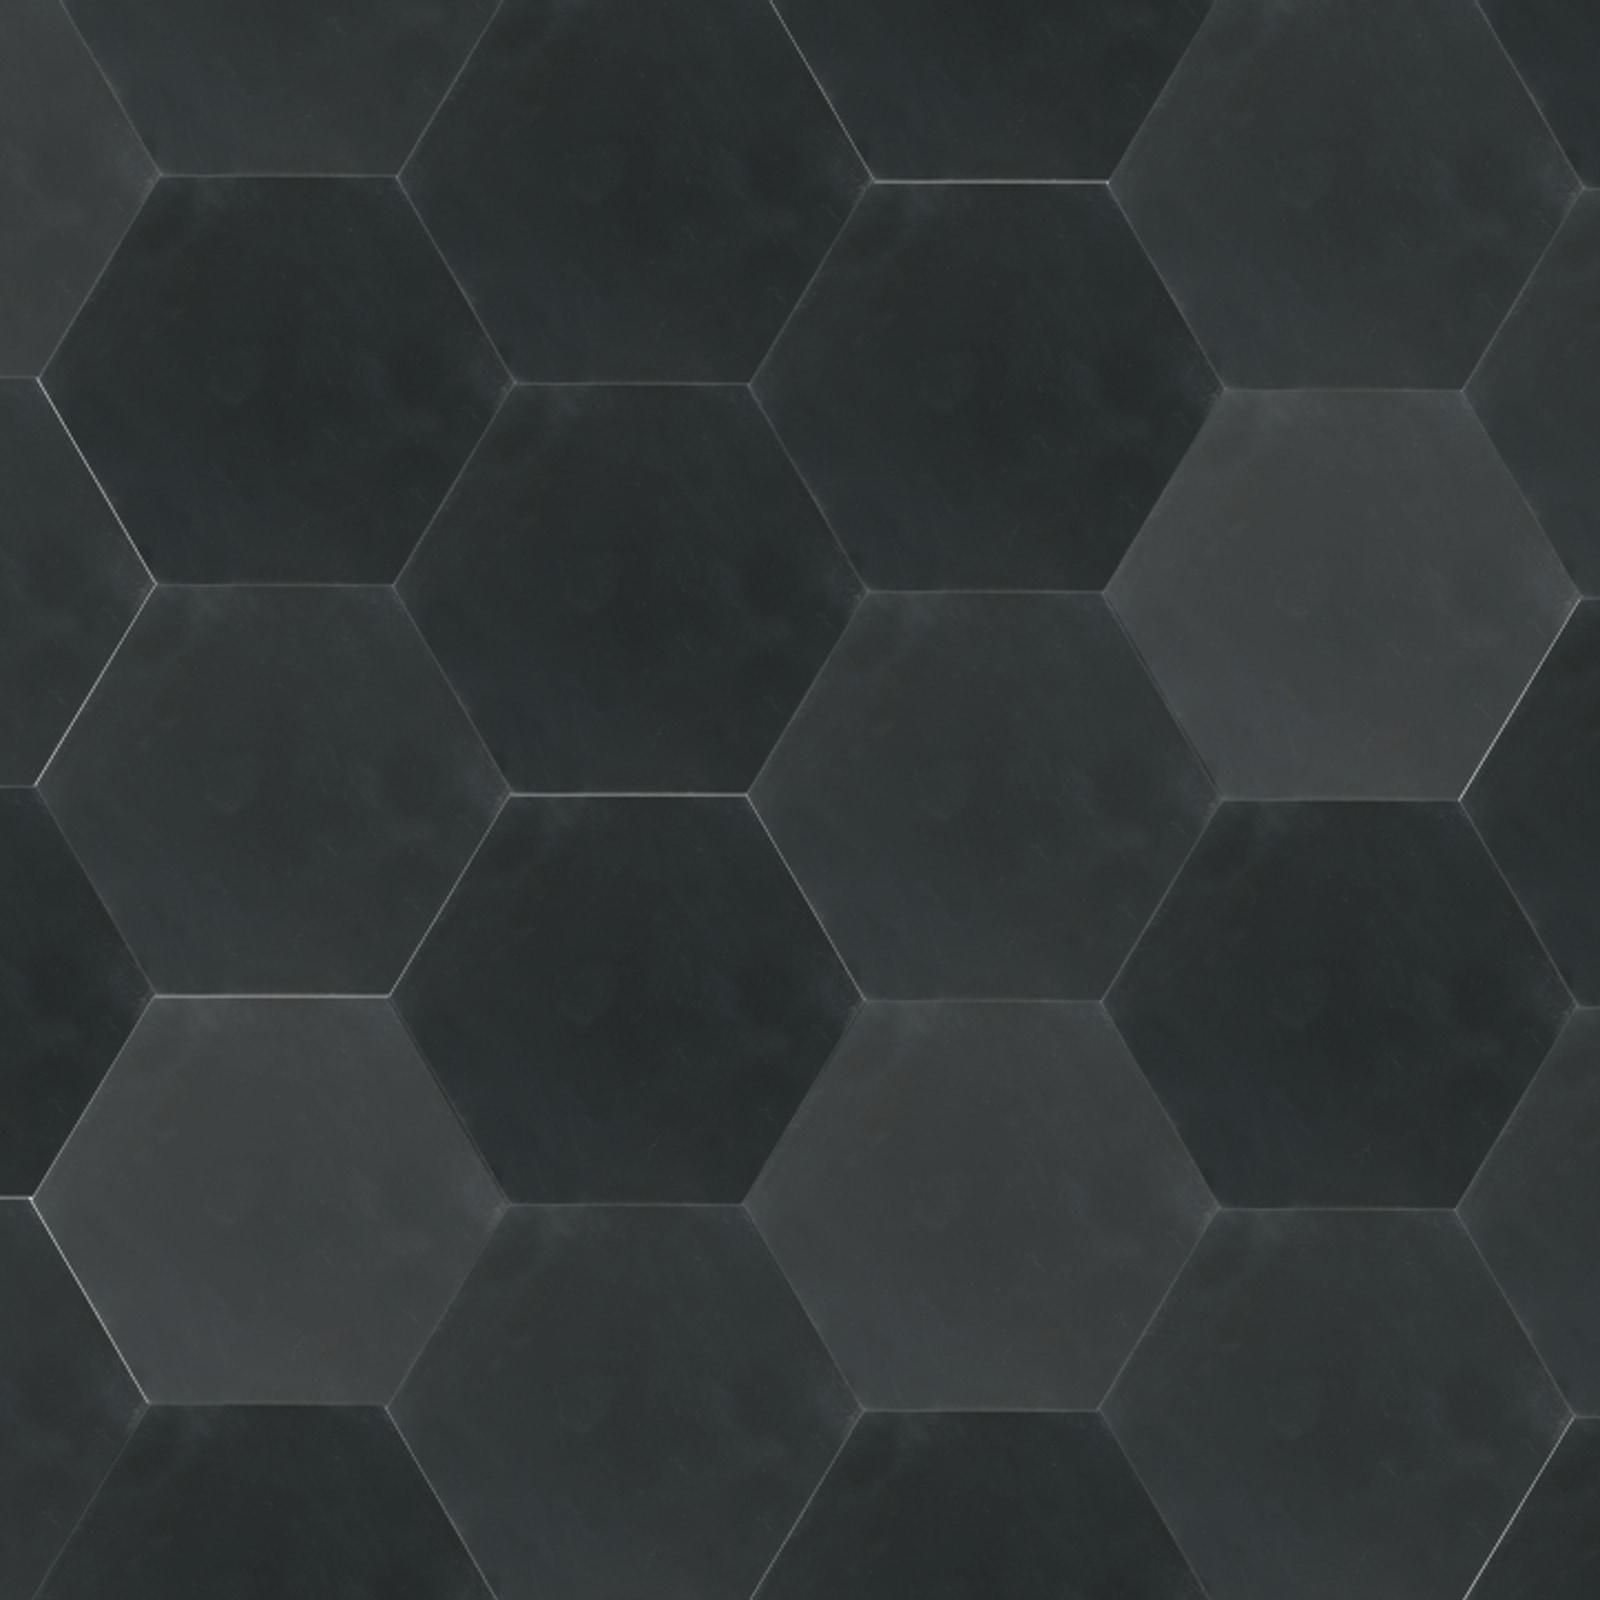 verlegemuster-6-60-via-gmbh-viaplatten | 6-60